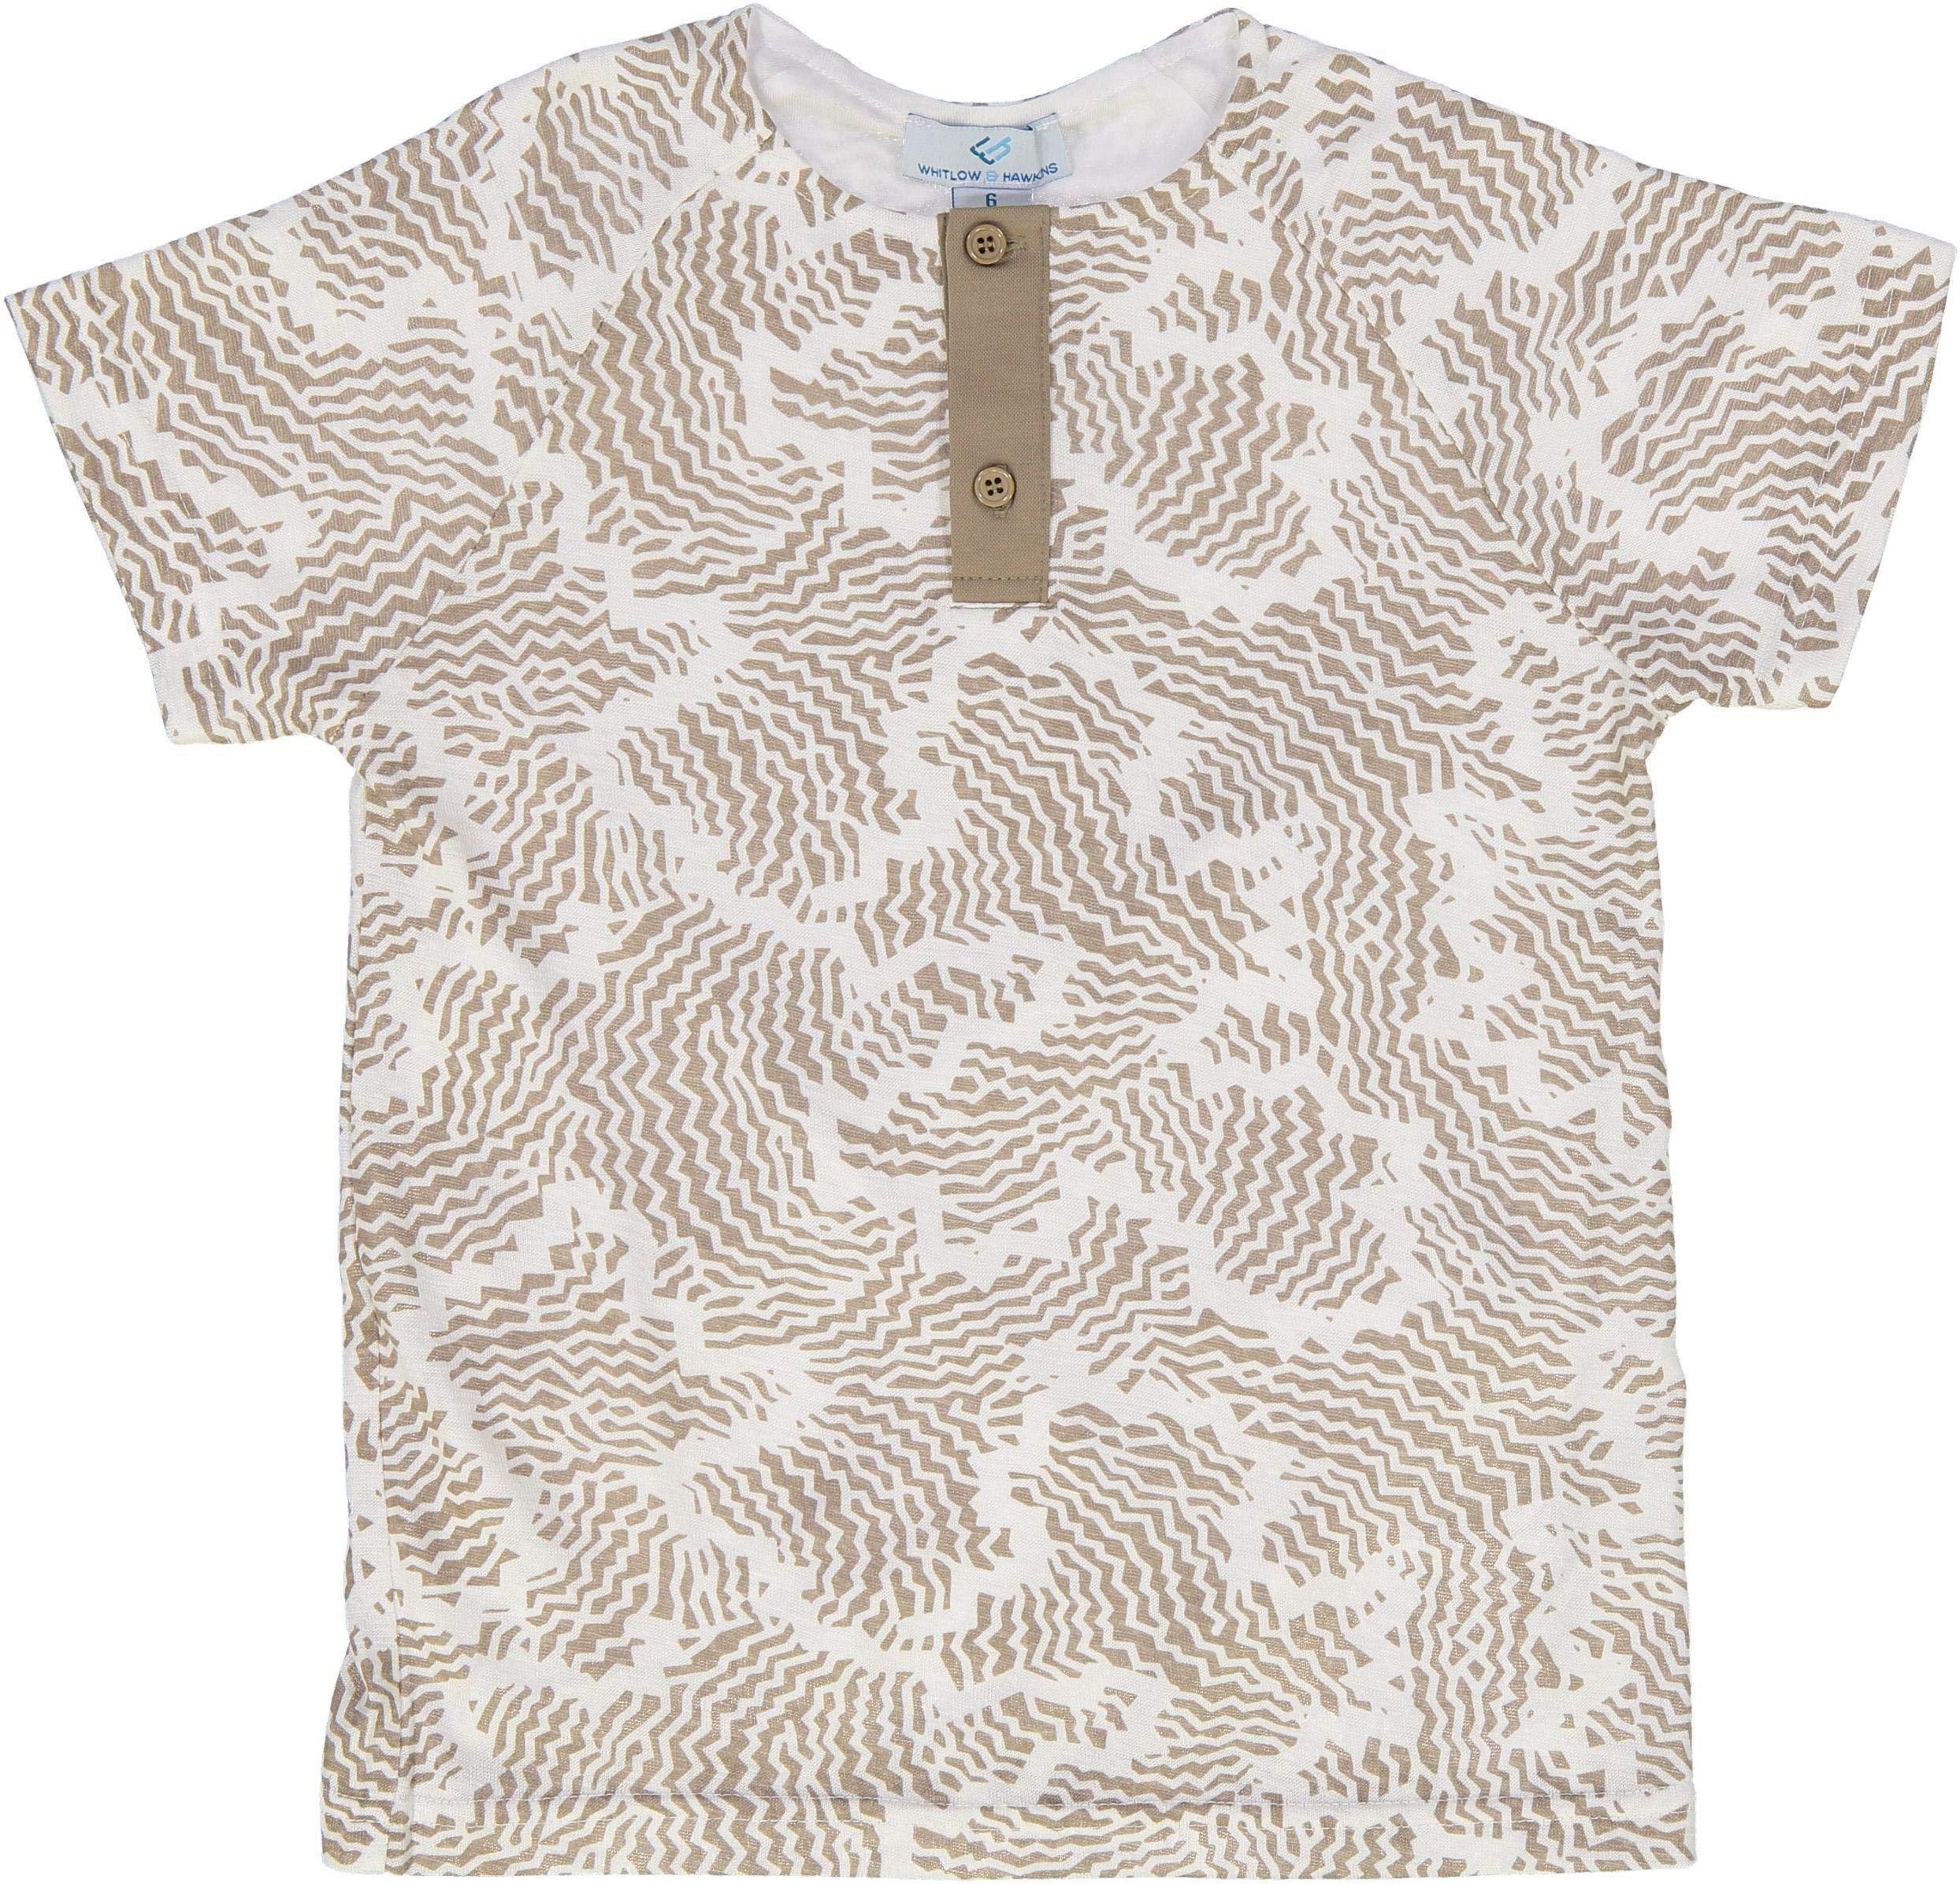 Whitlow & Hawkins Boys Short Sleeve Dress Shirt with No Collar - 6182 - Camel, 8